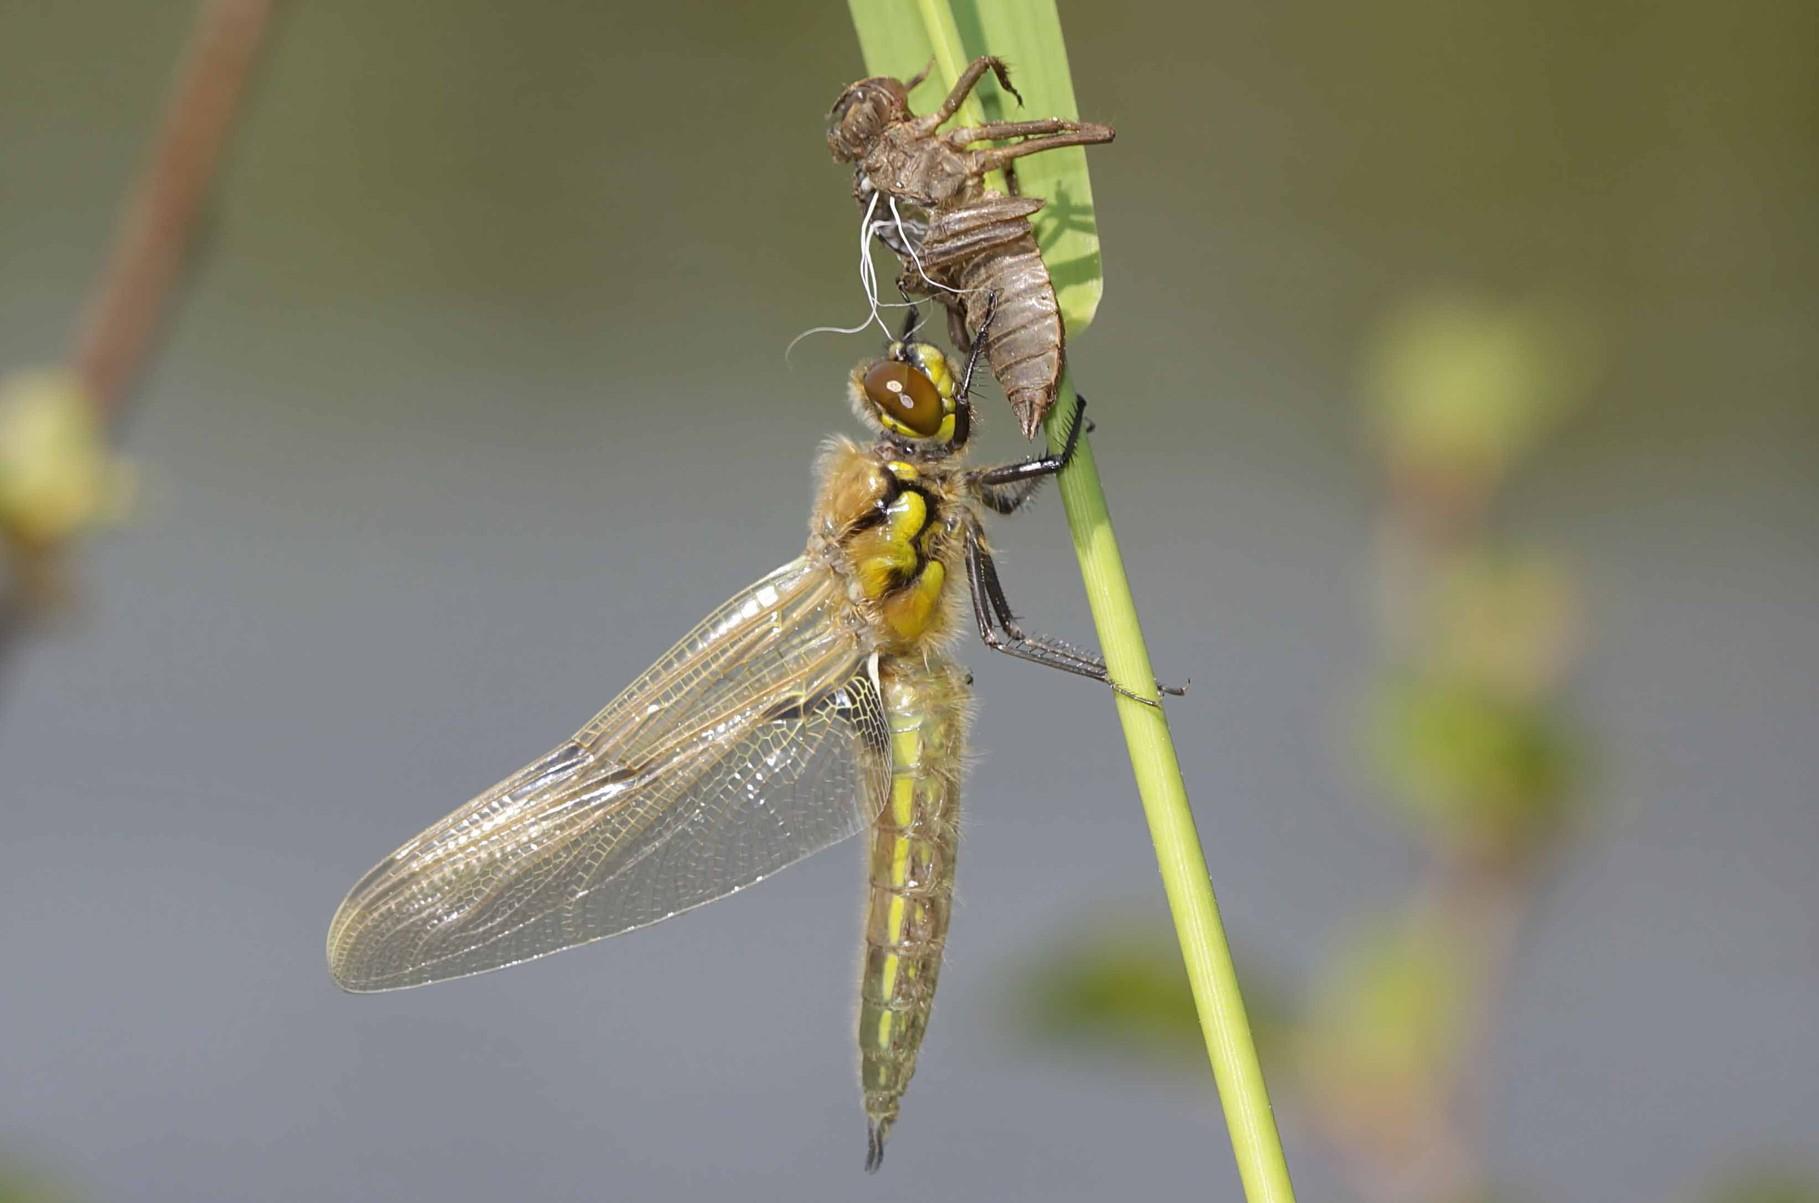 ...Vierfleck, Libellula quadrimaculata, kurz vor der Entfaltung der Flügel...